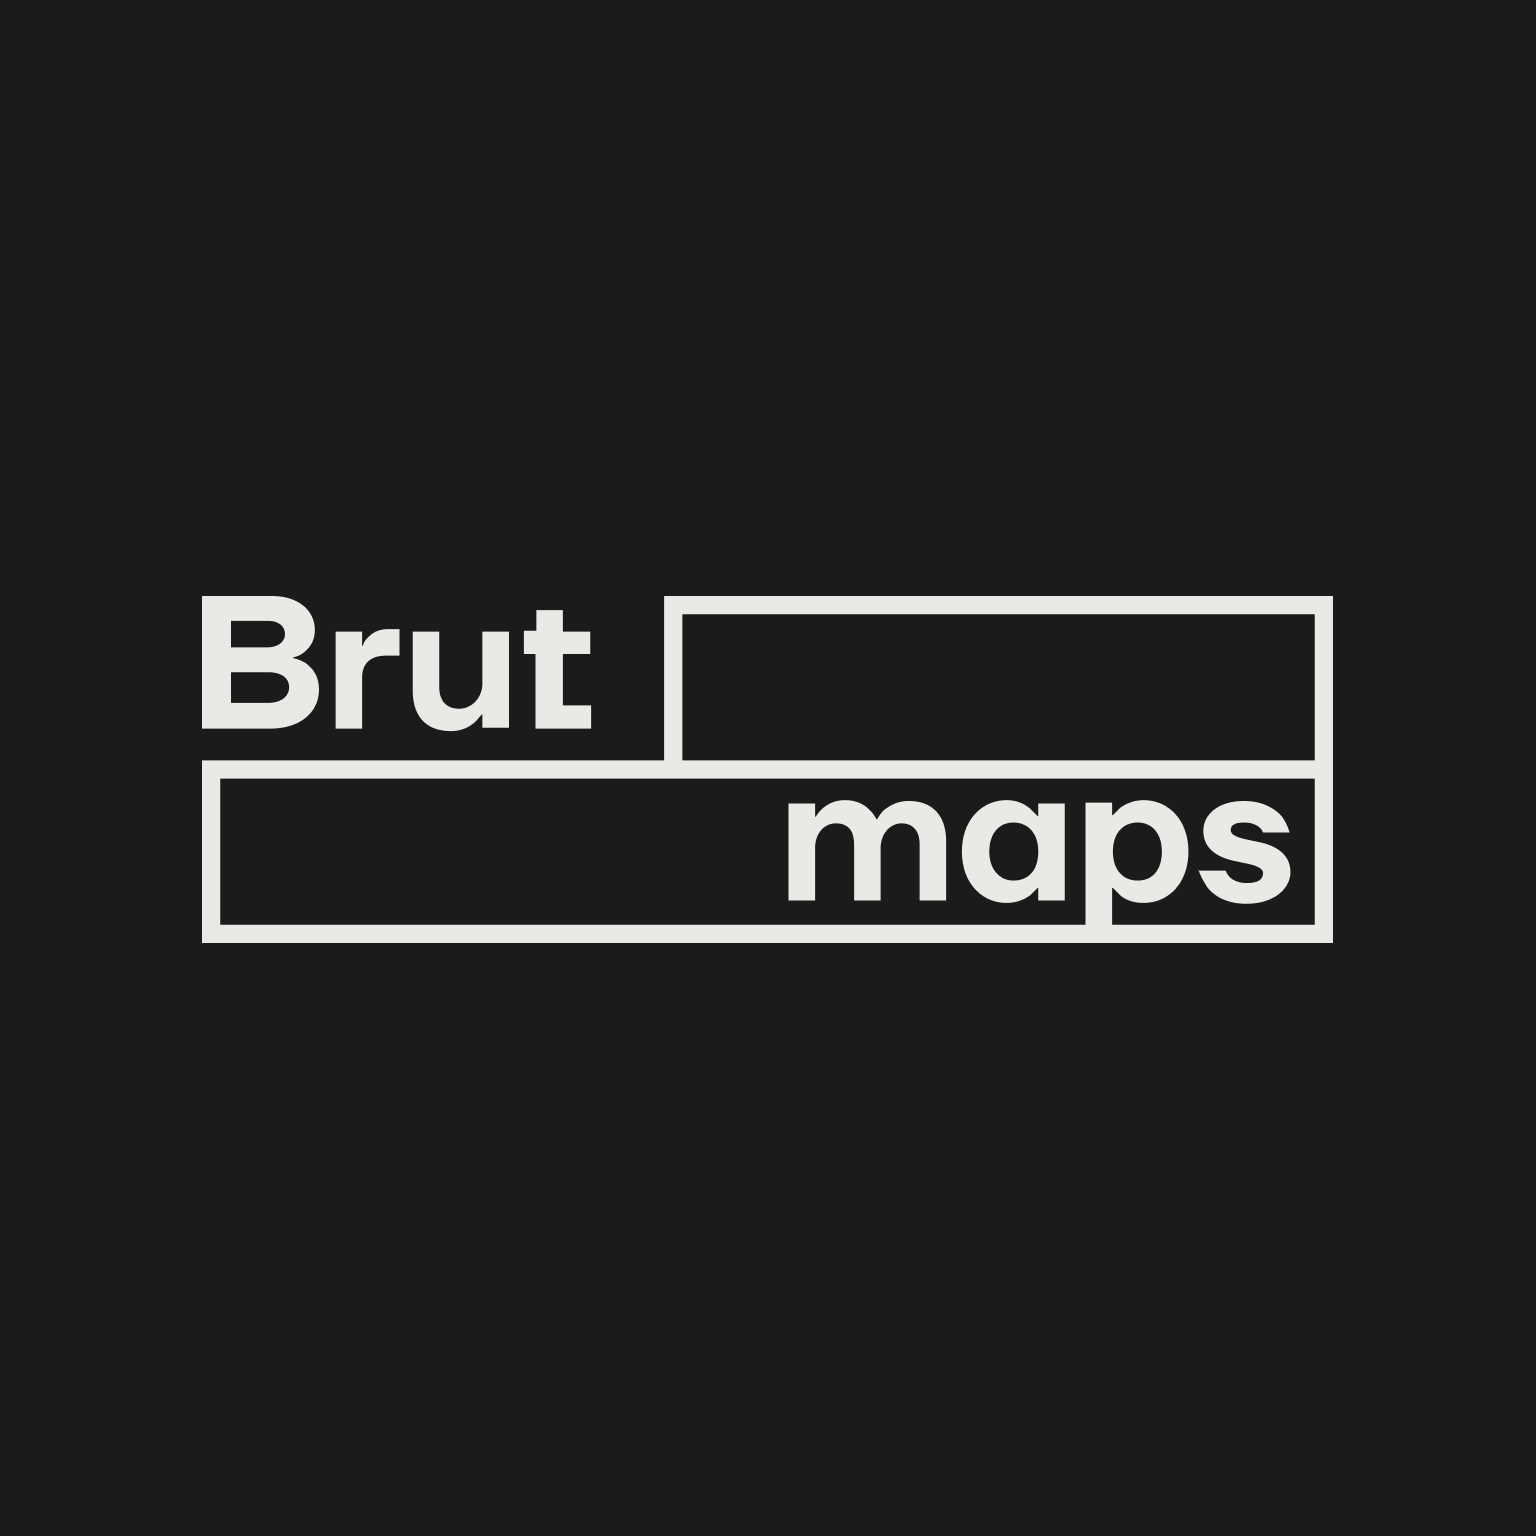 Brutmaps